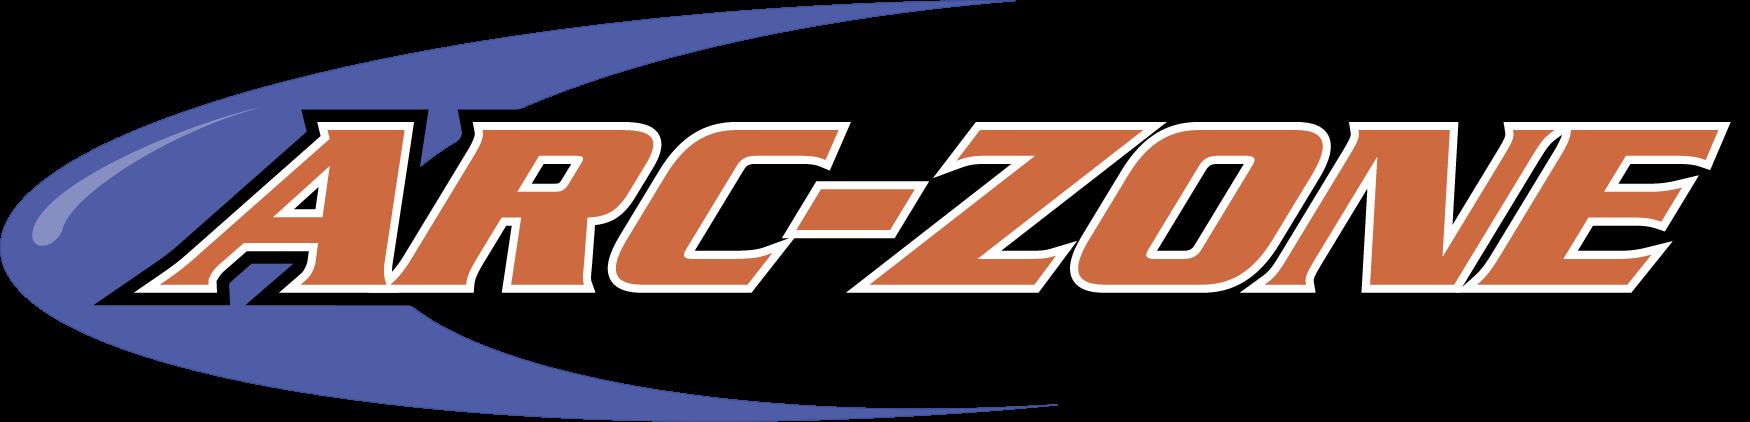 Arc zone supplies ebay. Welding clipart electrode holder